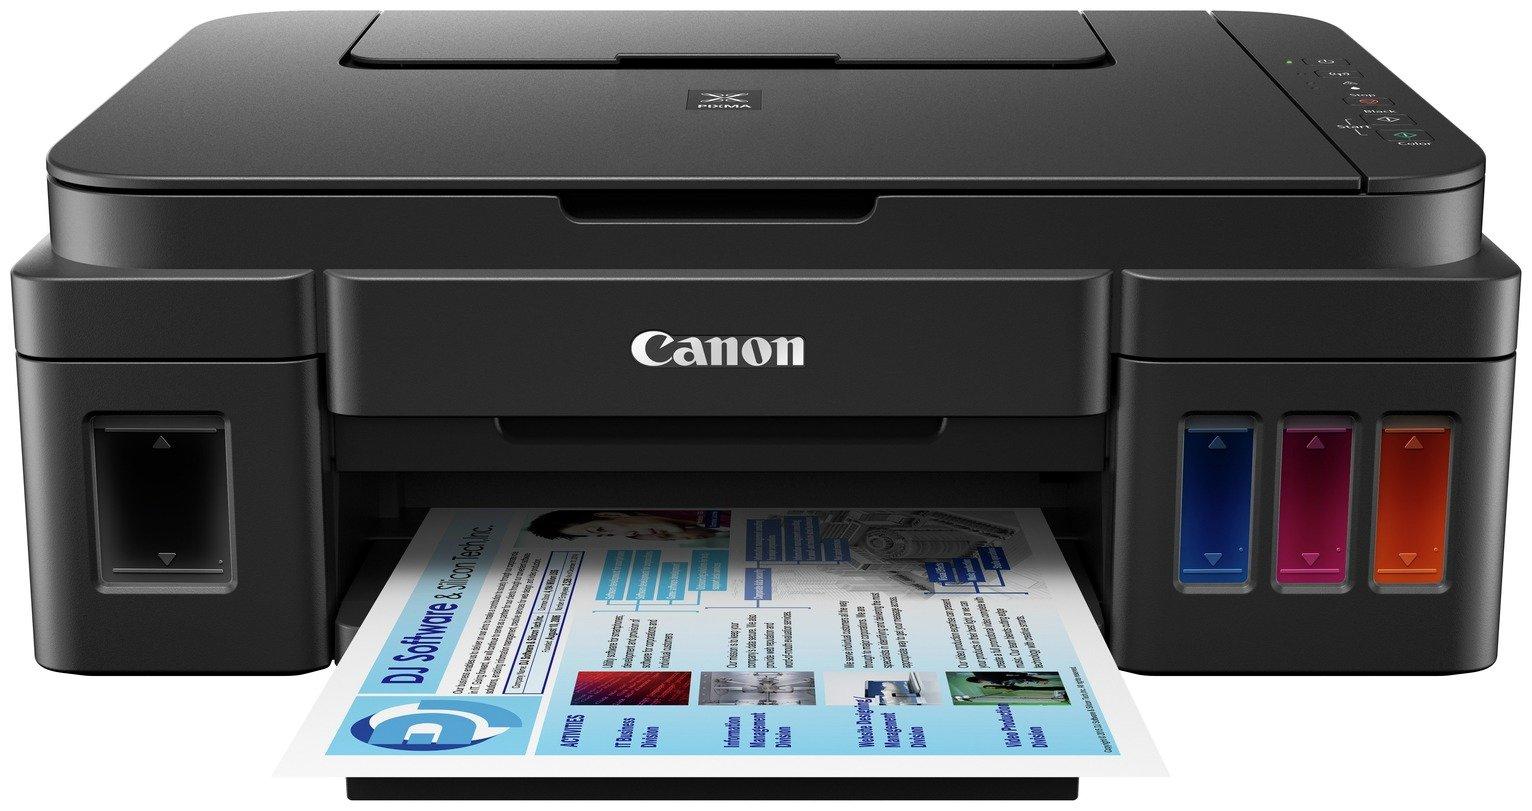 Canon PIXMA G3501 Wireless Ink Tank Printer